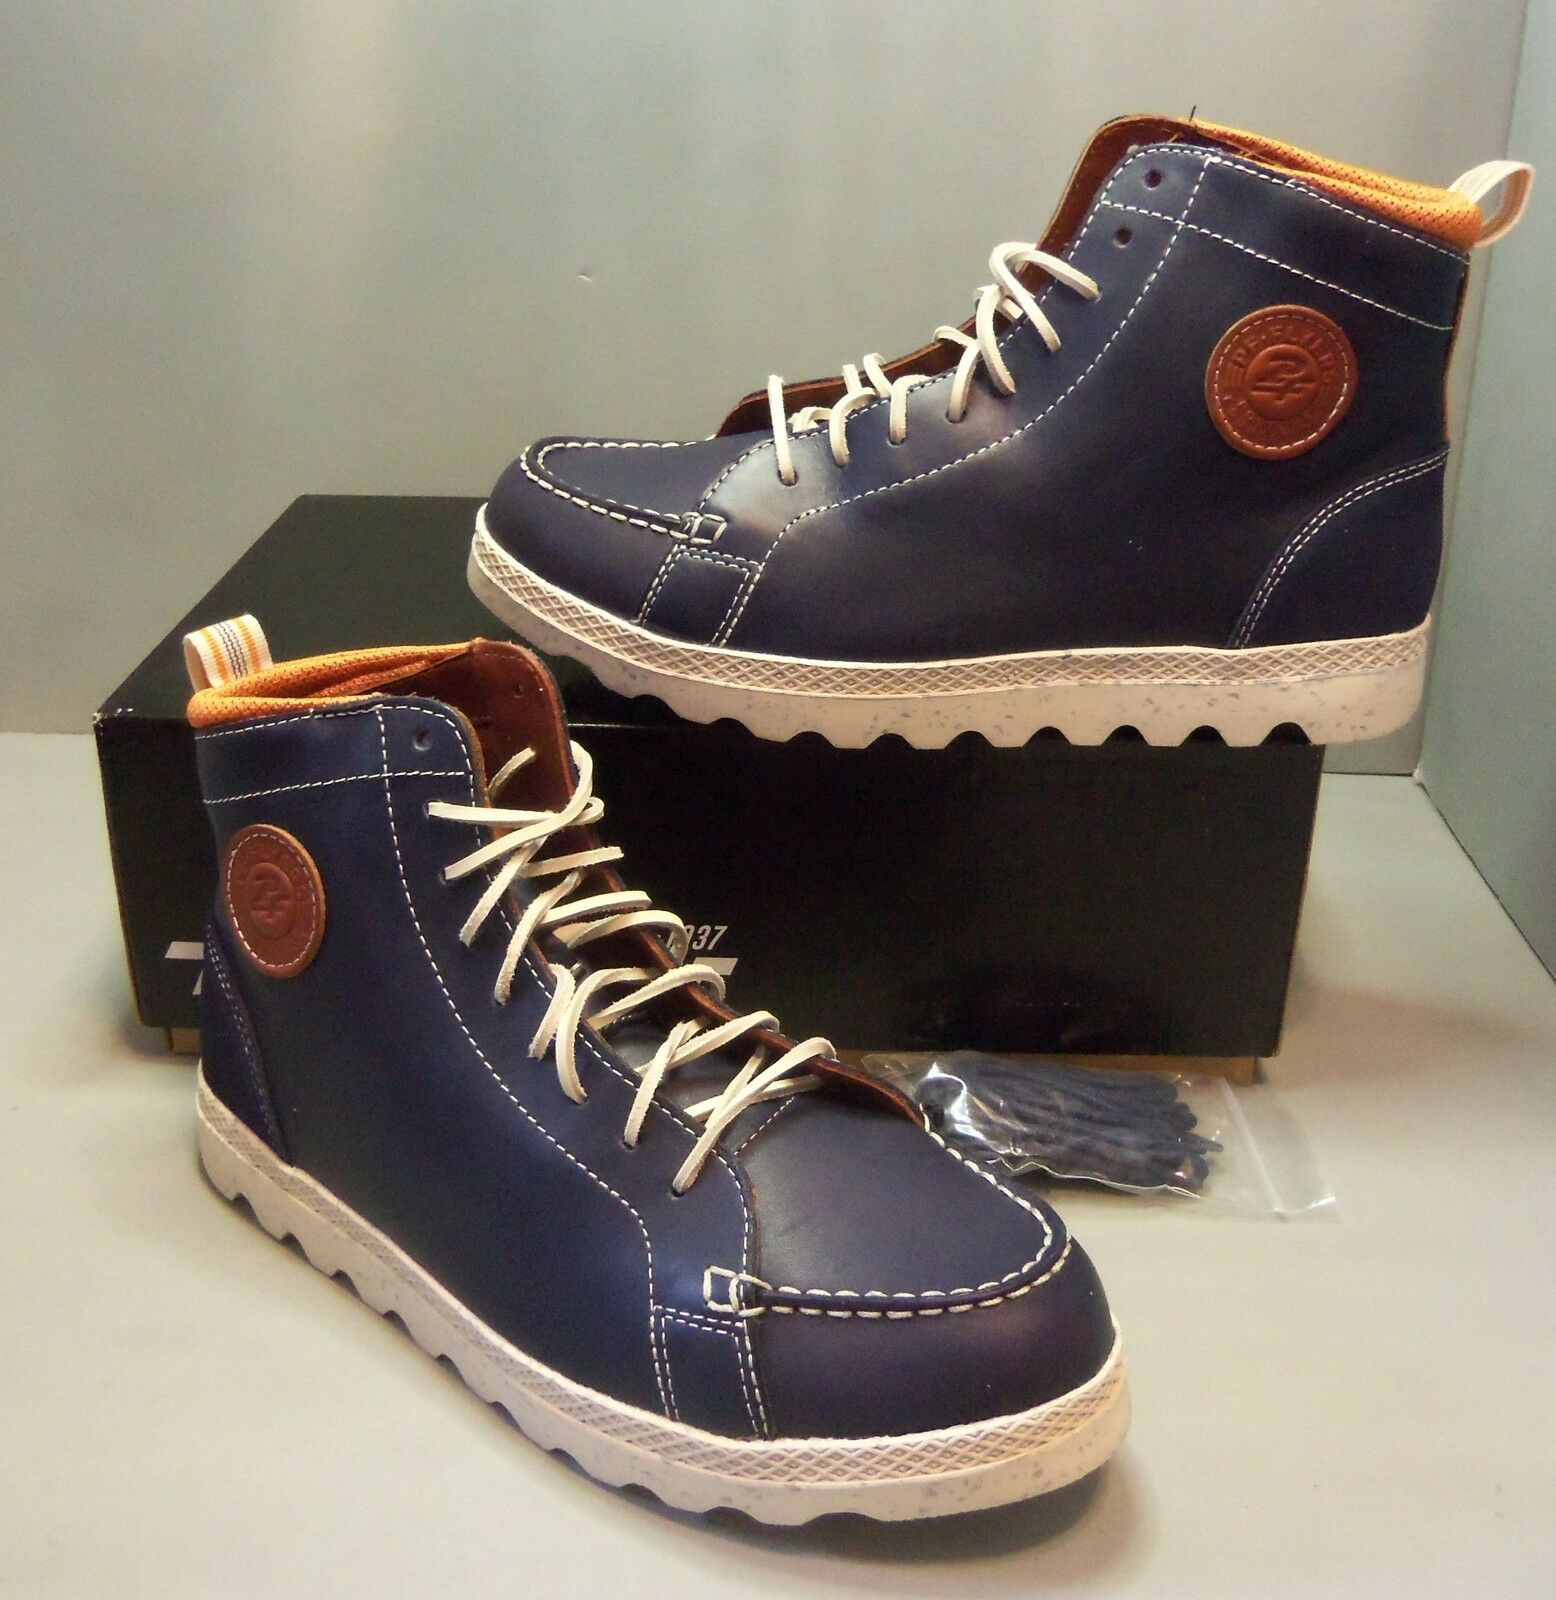 new styles f92b3 8b1ff PF Flyers Men s Brewster Hi High Top Navy Blue Blue Blue Leather Shoes  SIZES! NIB